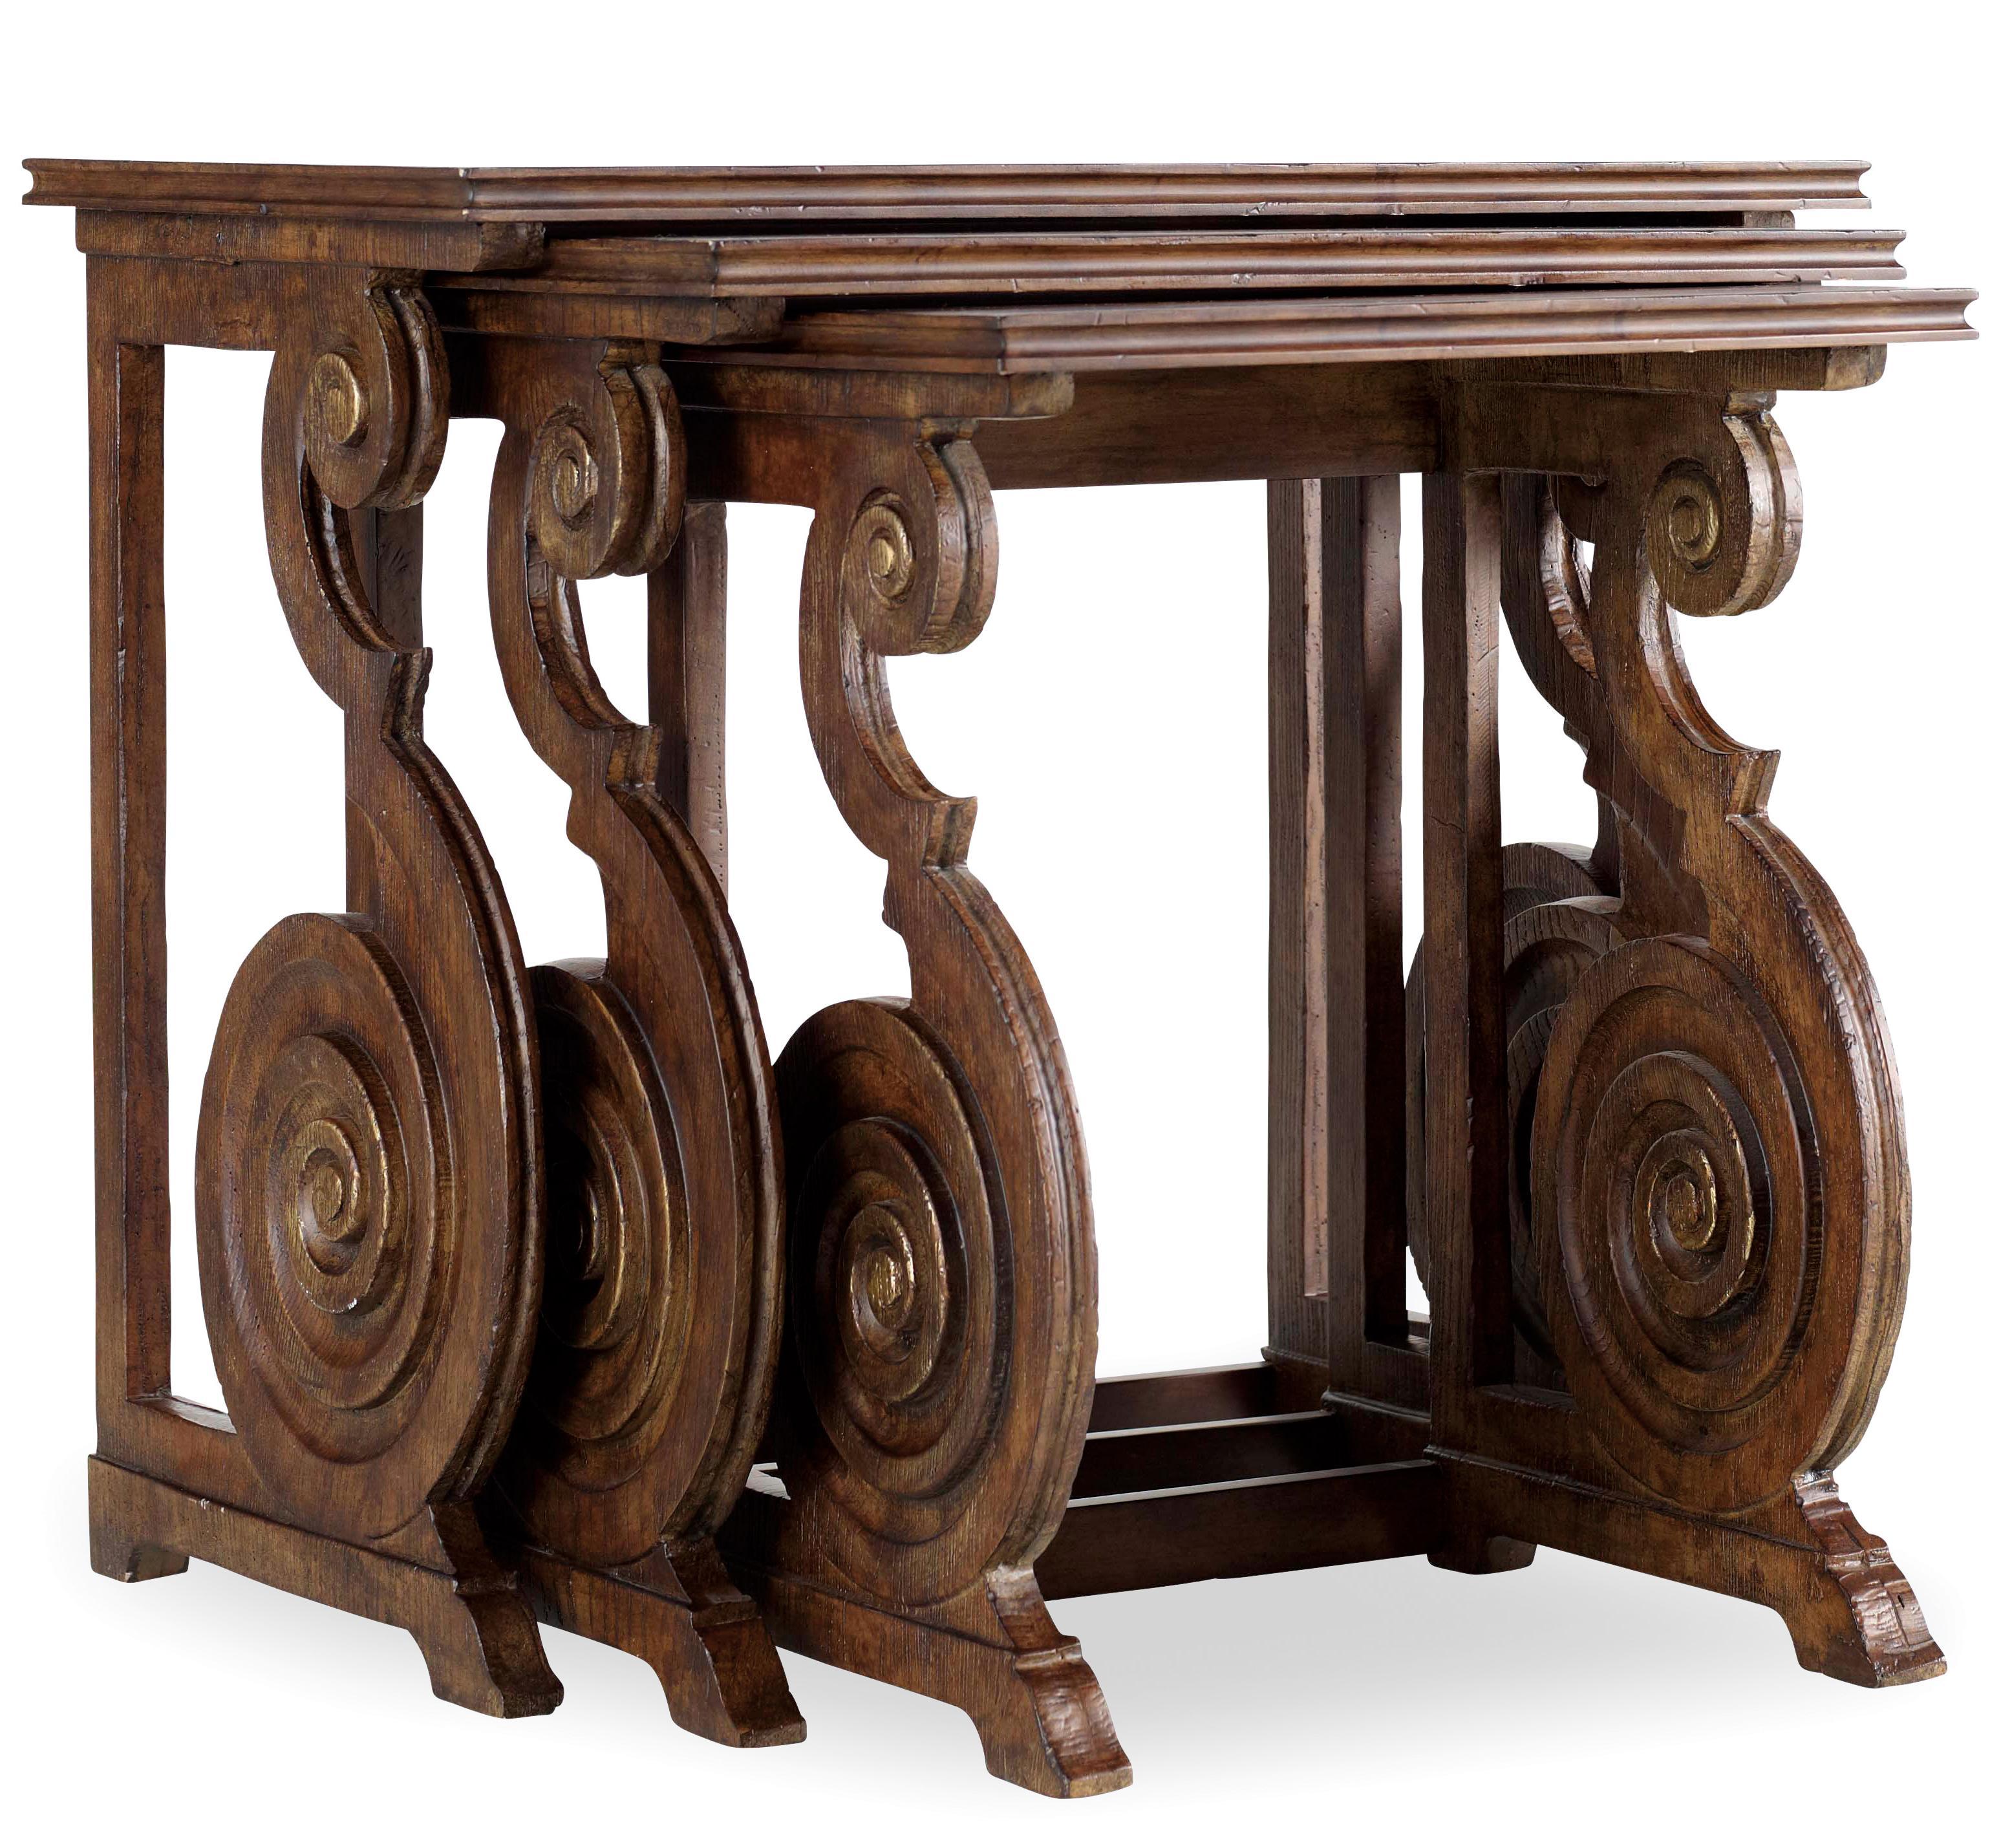 Hooker Furniture Adagio Nest of Tables - Item Number: 5091-50003